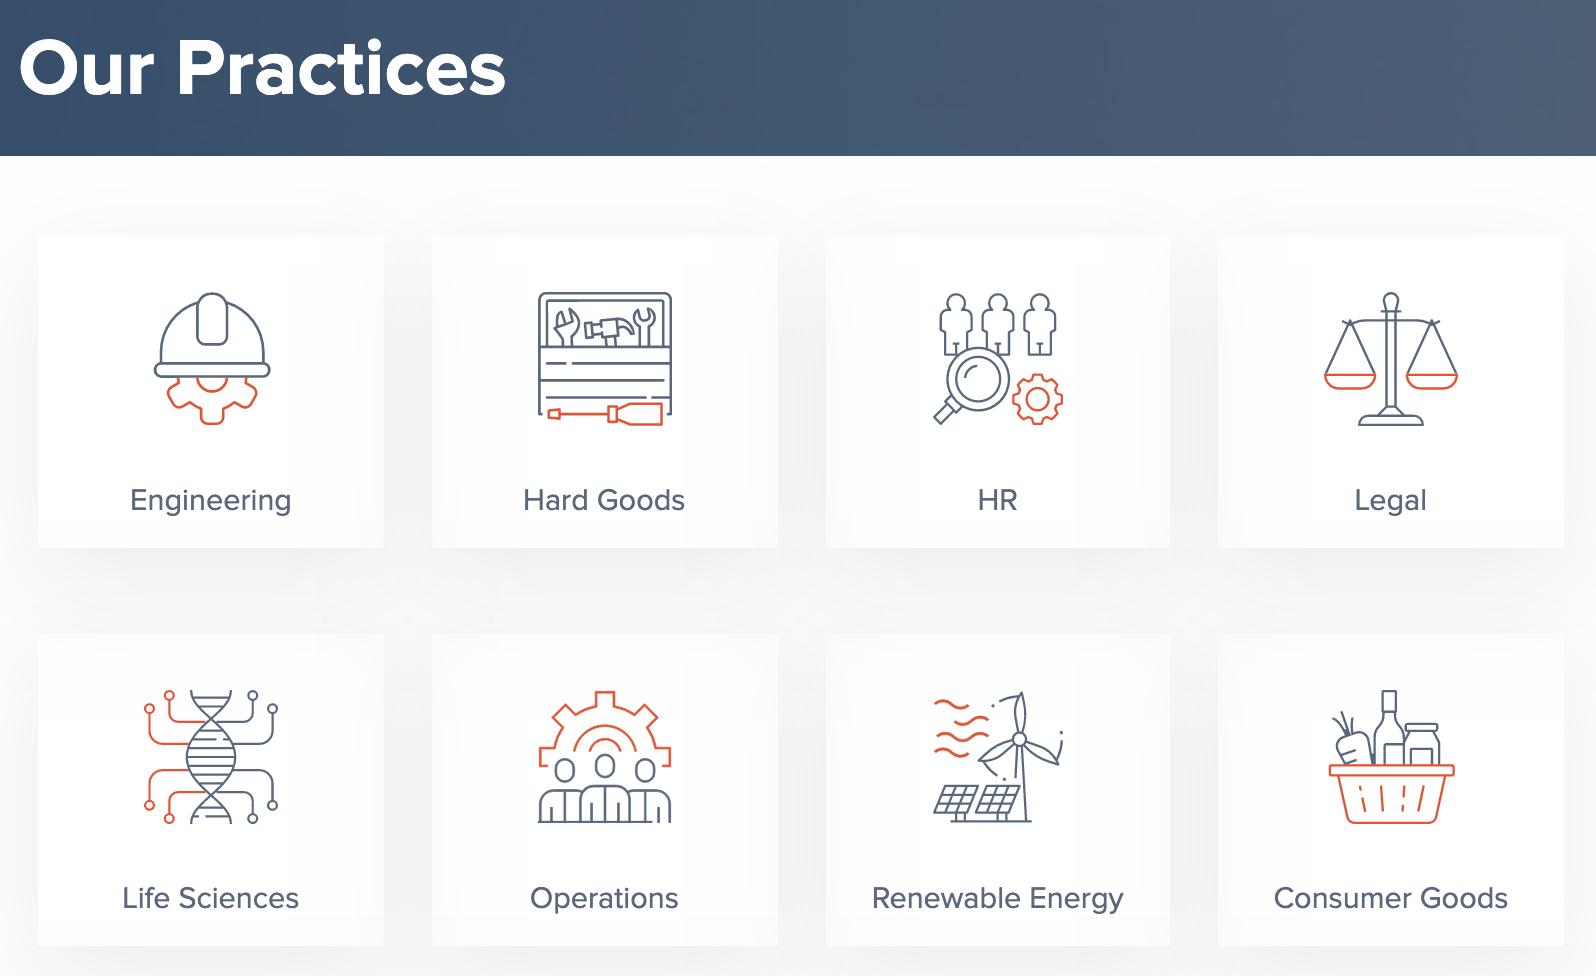 005-Practice-Areas